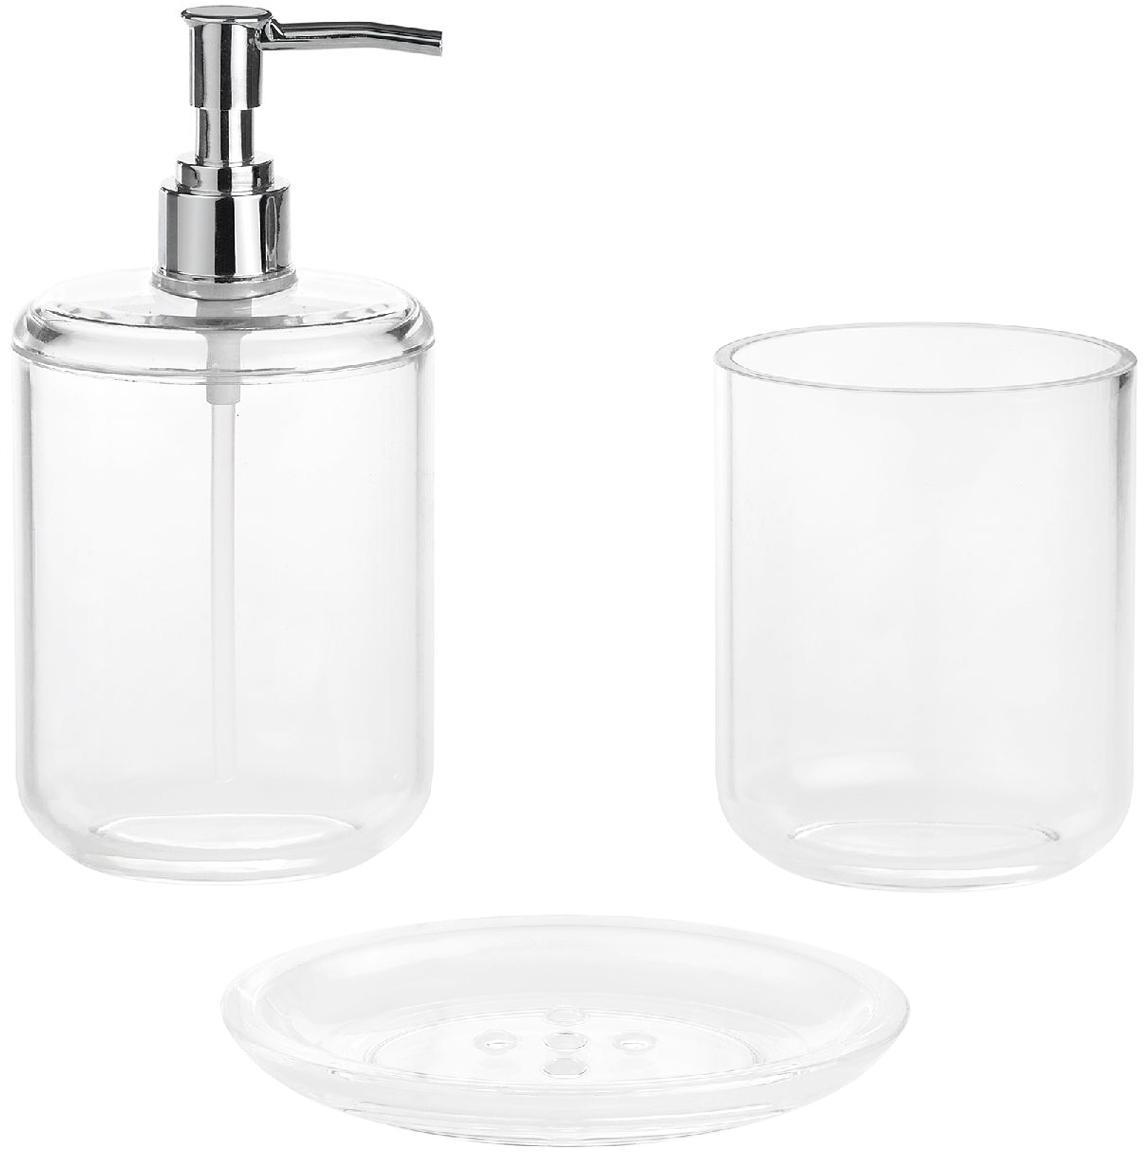 Seifenspender Delan aus Acrylglas, Behälter: Acrylglas, Pumpkopf: Kunststoff, Transparent, Chrom, Ø 7 x H 19 cm